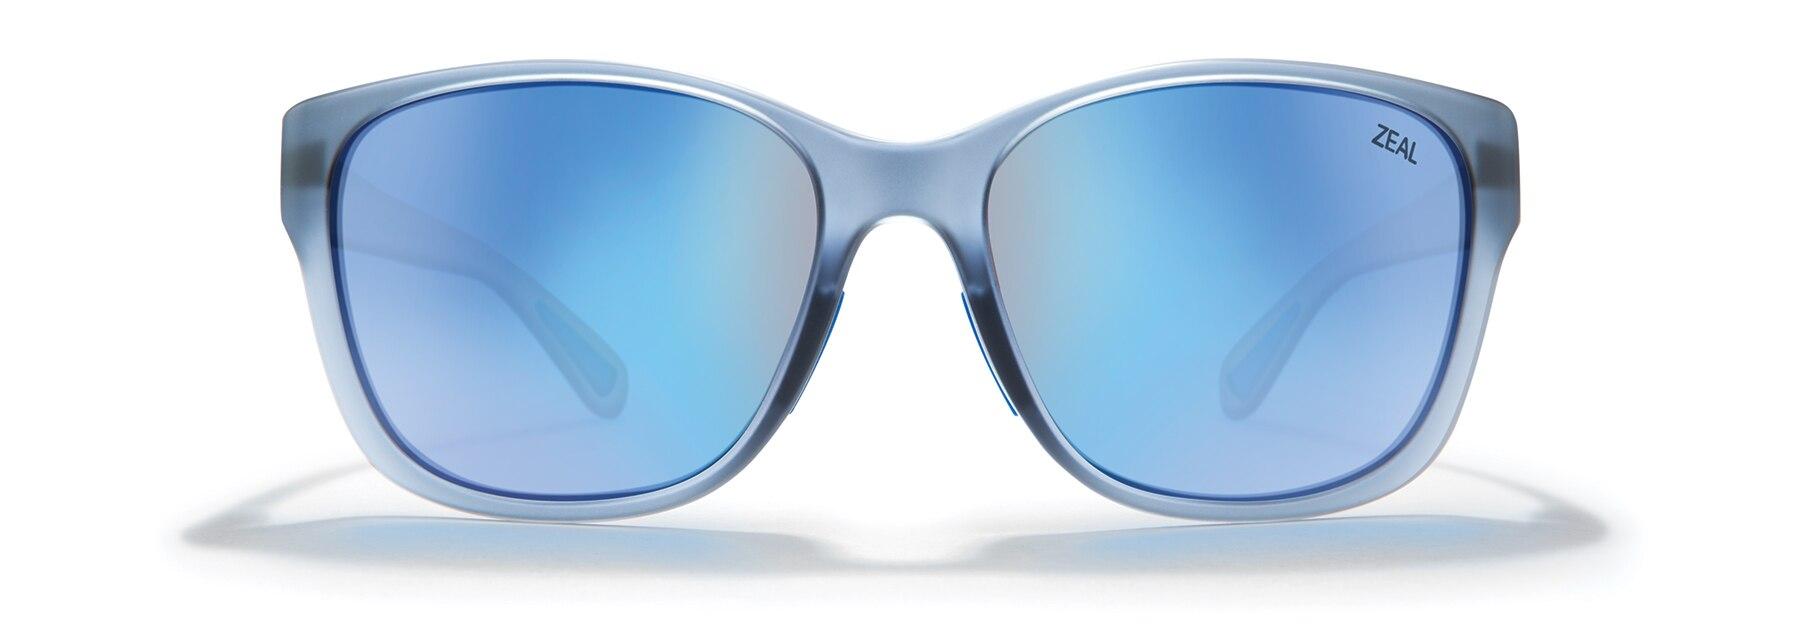 d7dd8e38fec Shop MAGNOLIA (Z1426) Sunglasses by Zeal